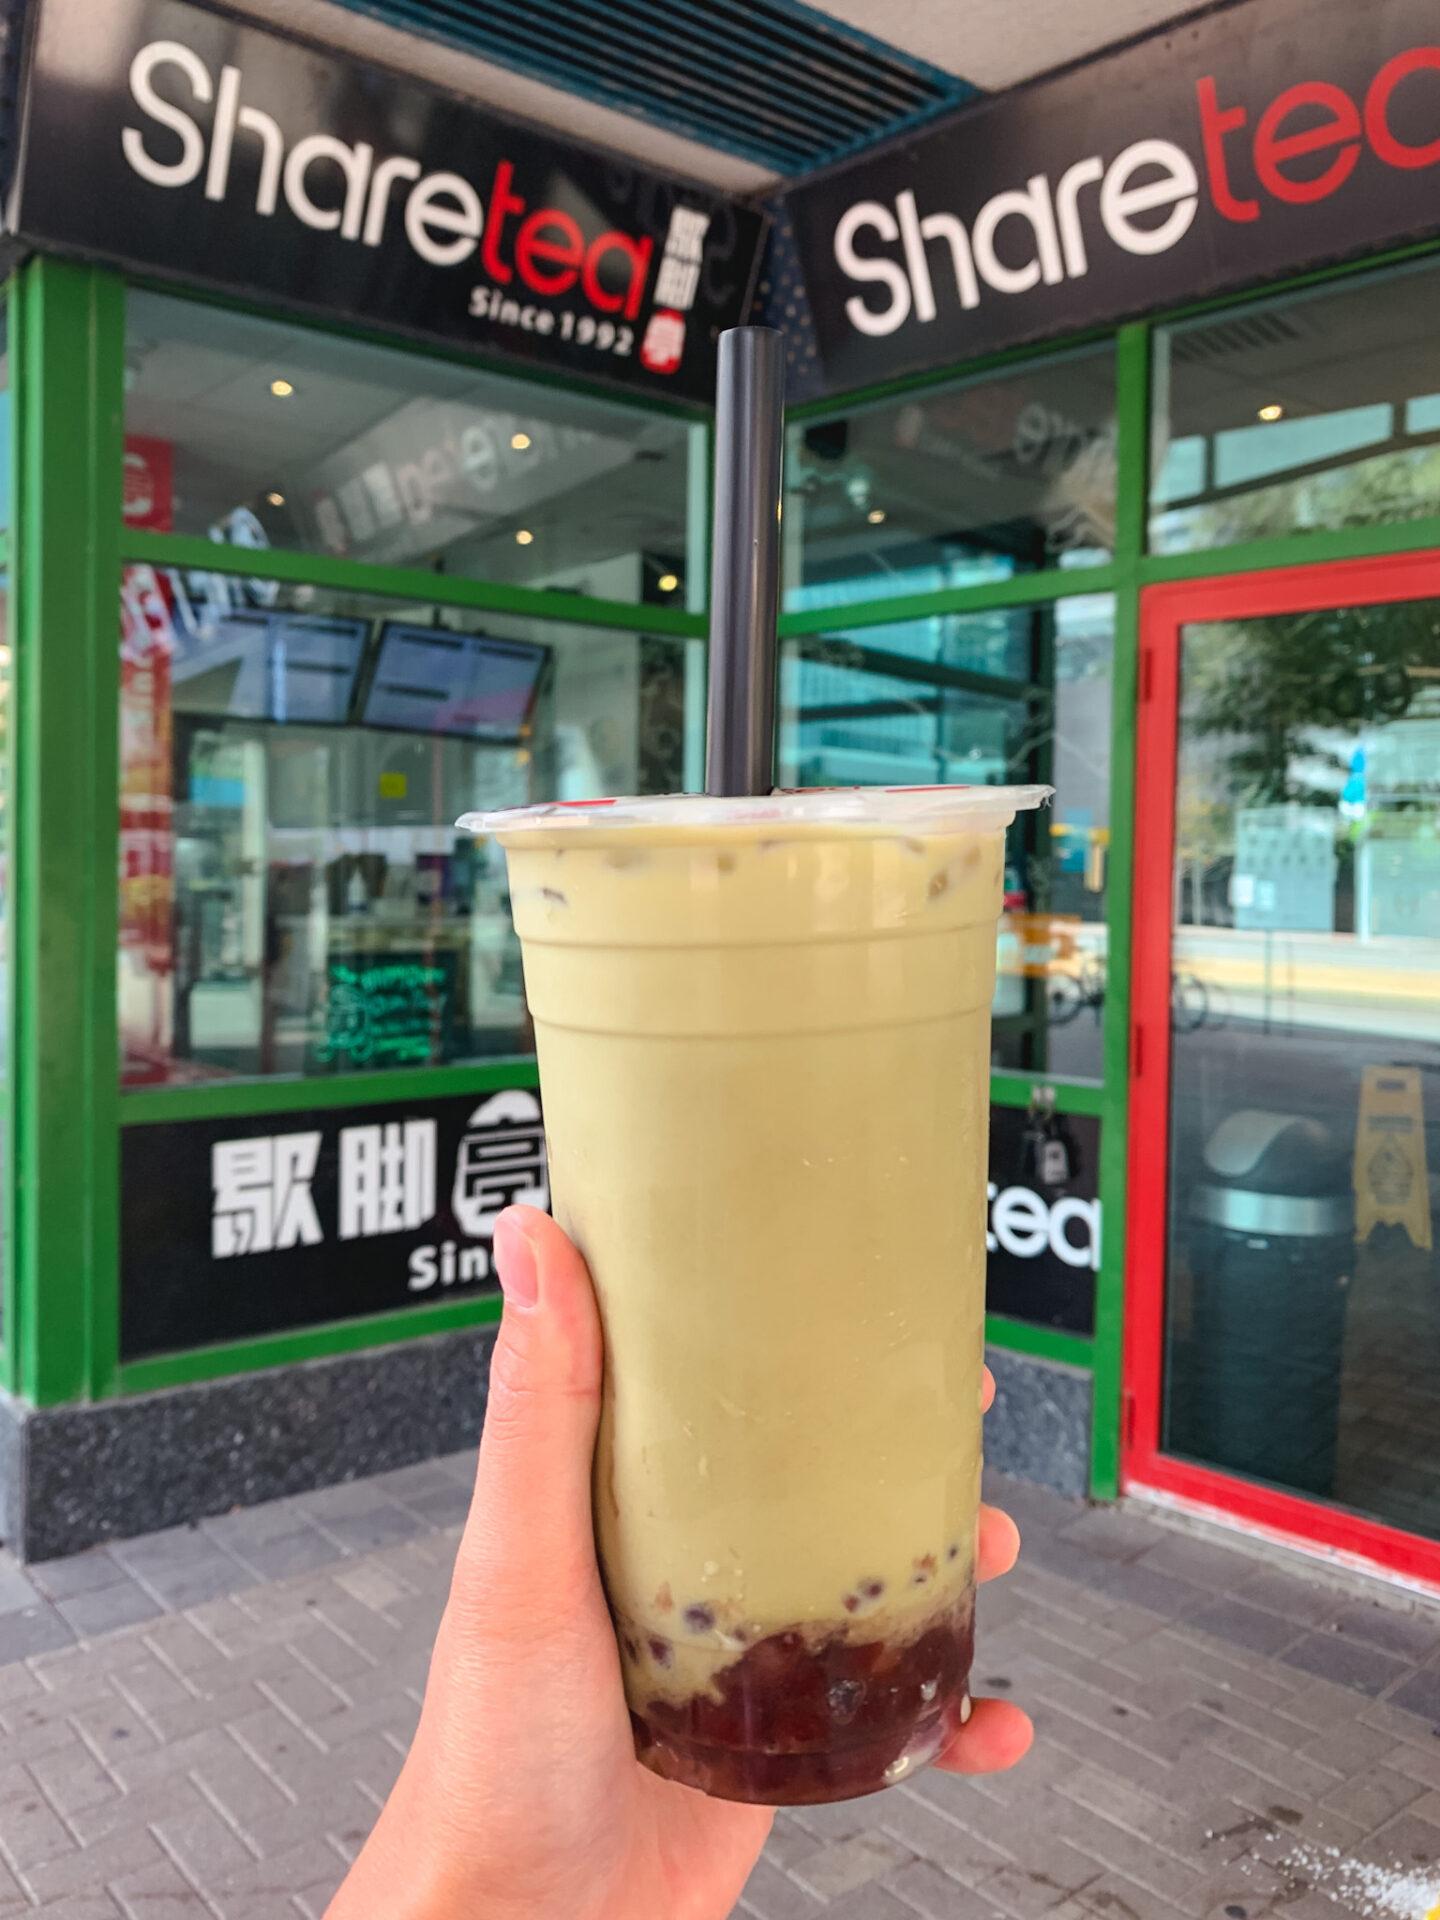 Matcha Red Bean Milk Tea from Sharetea, a bubble tea shop in Toronto